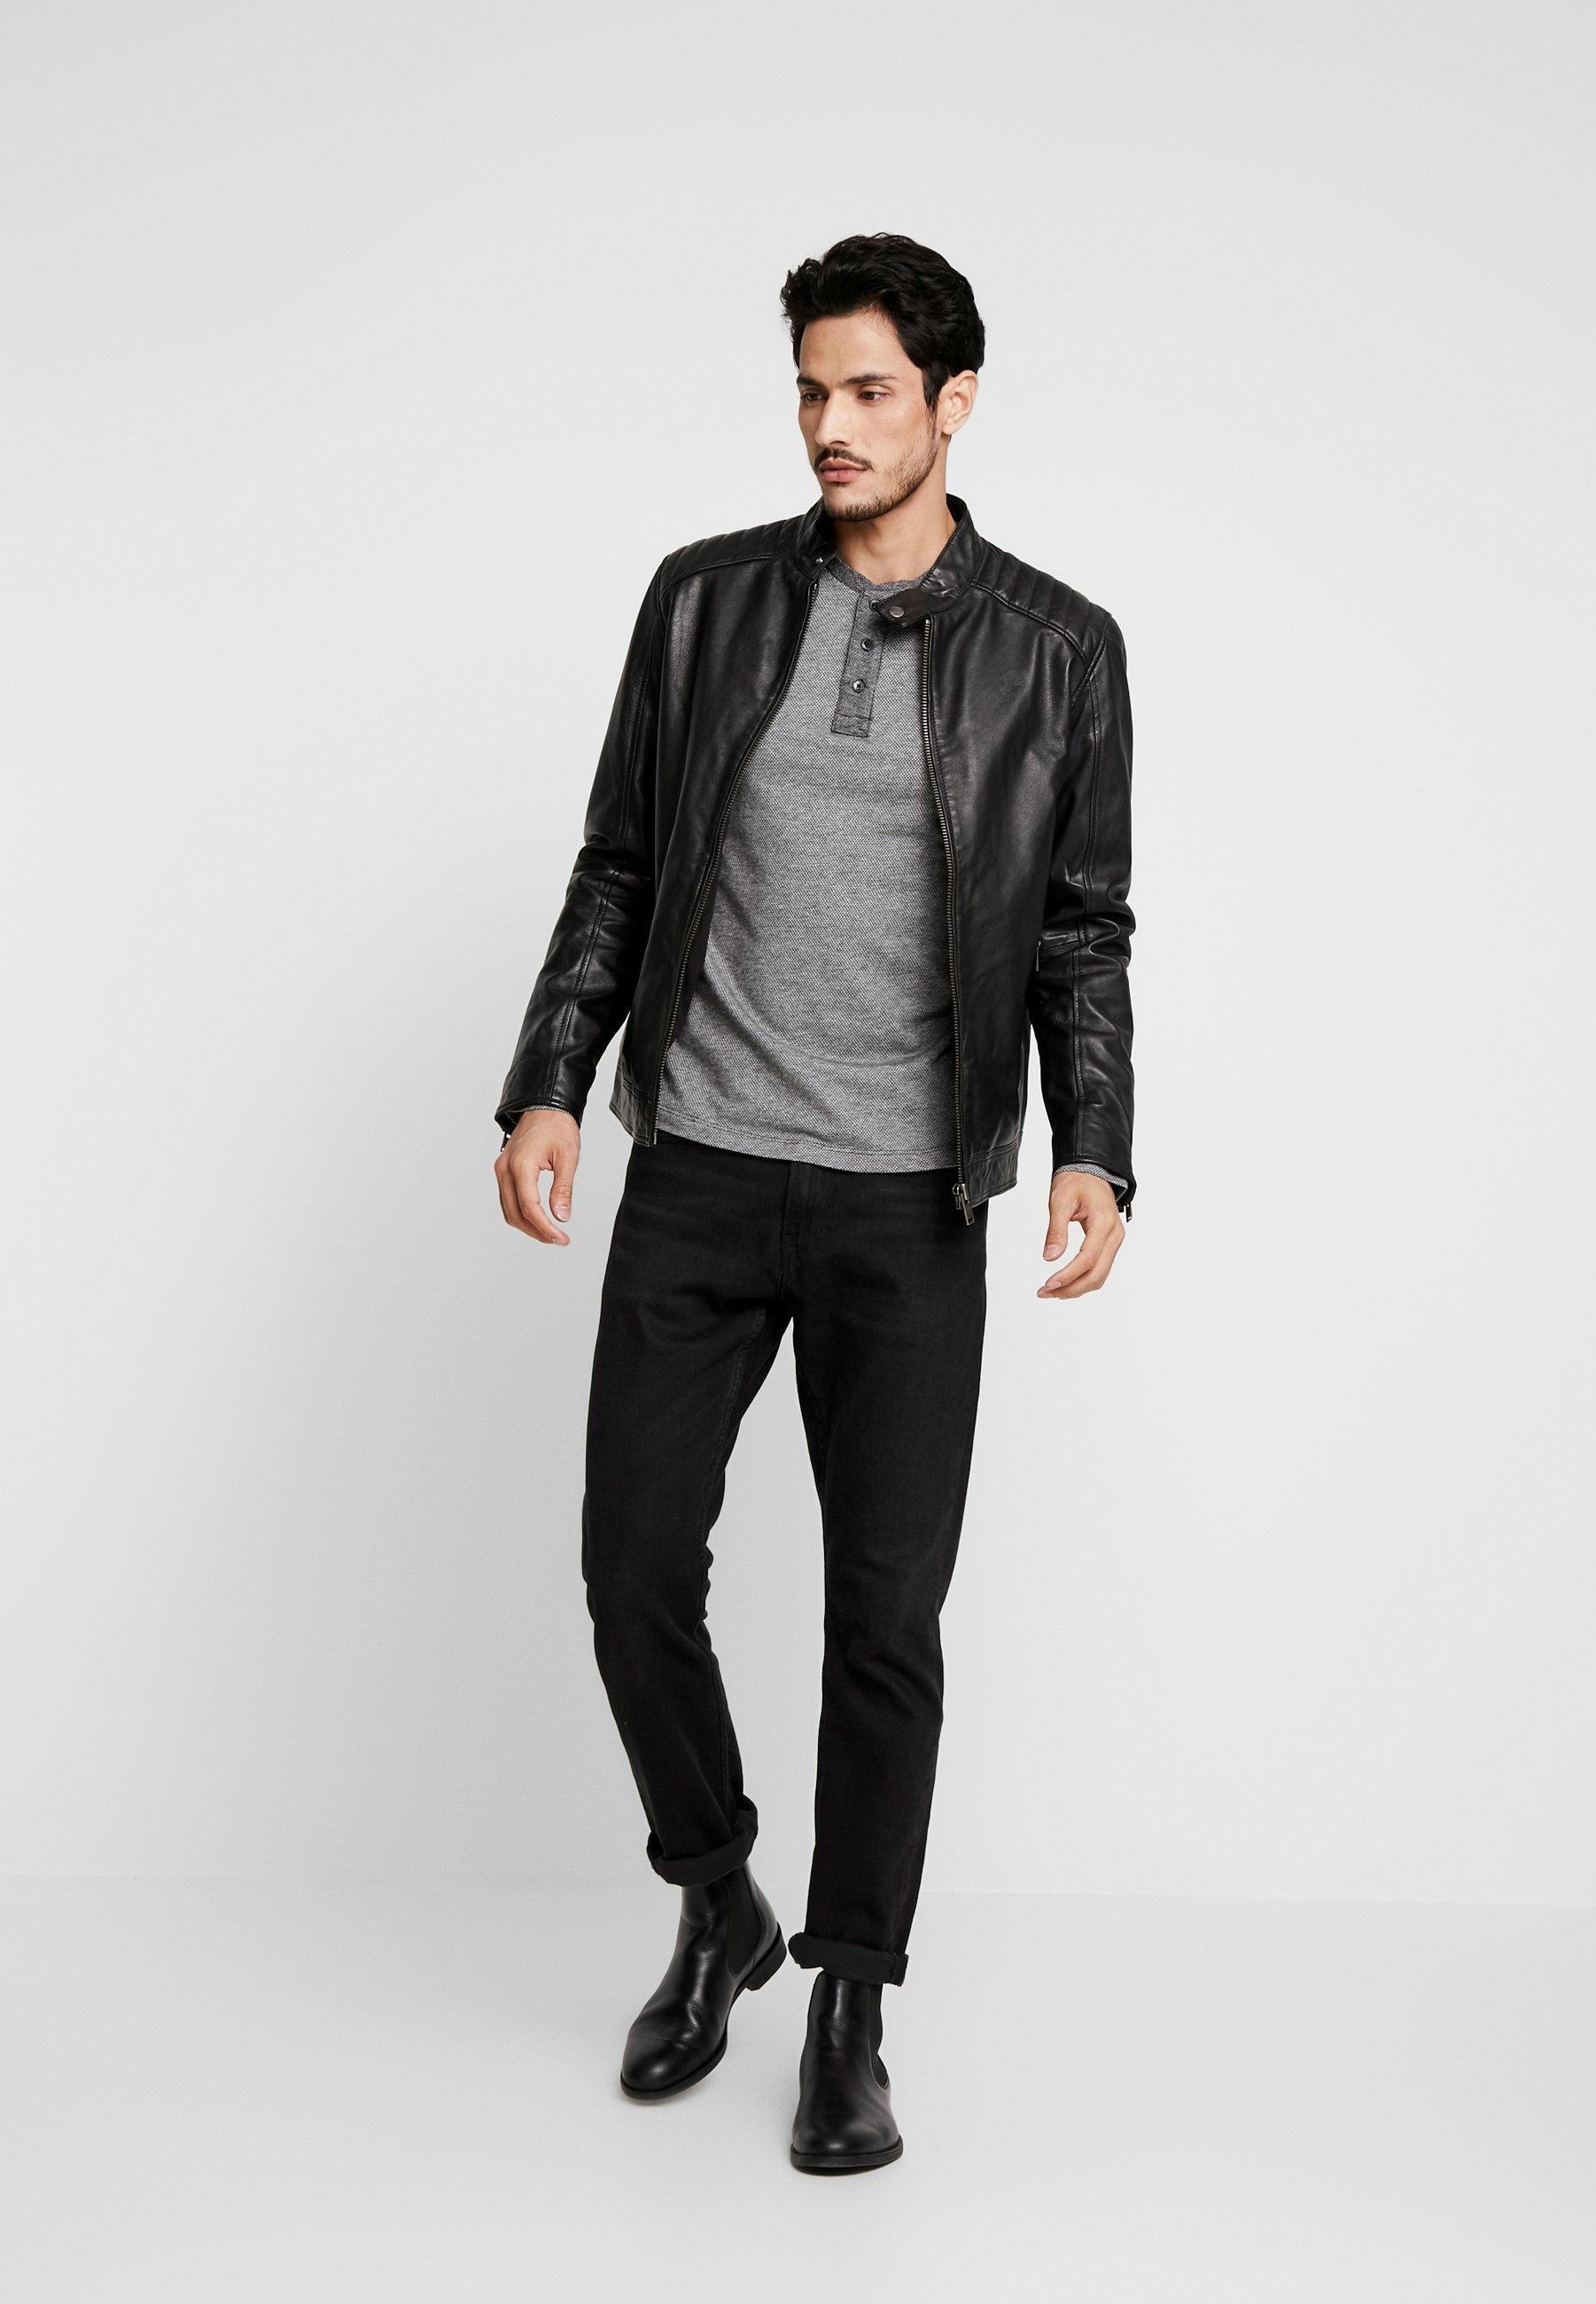 Tom Tailor Denim Structured Fabric - T-shirt À Manches Longues Black/grey